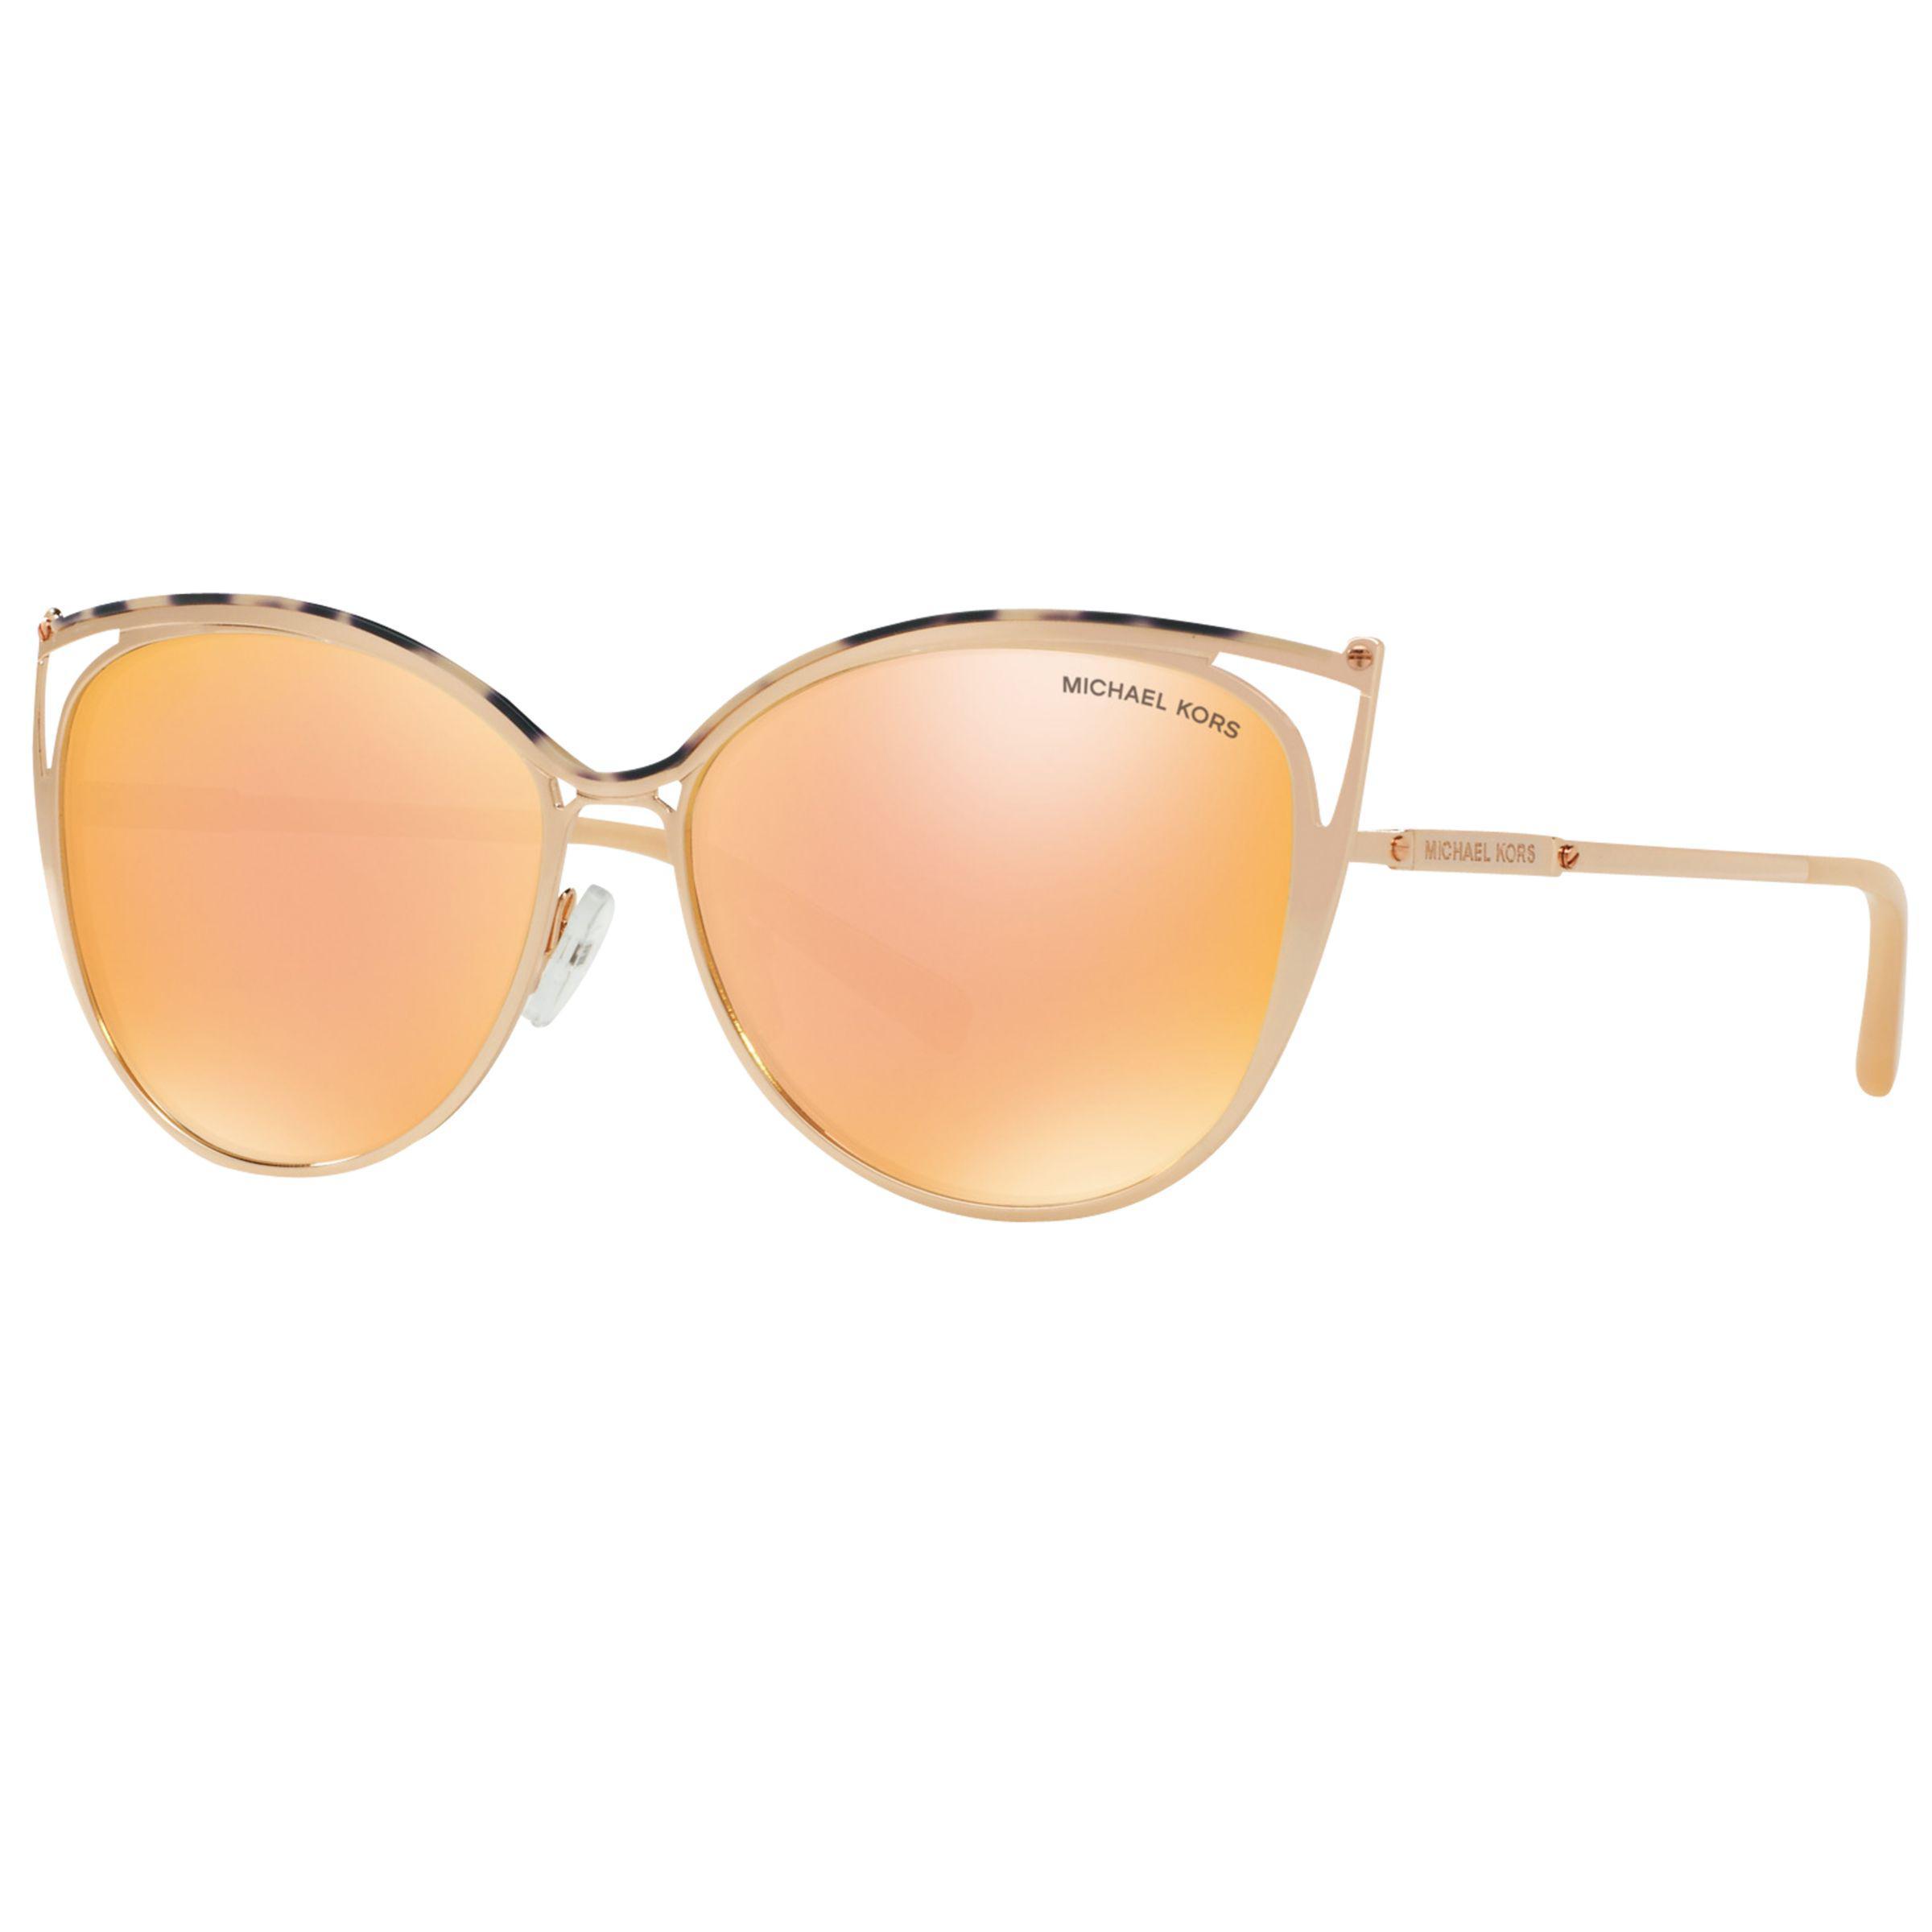 11cb9a5ae2006 Michael Kors Mk1020 Ina Cat s Eye Sunglasses in Metallic - Lyst